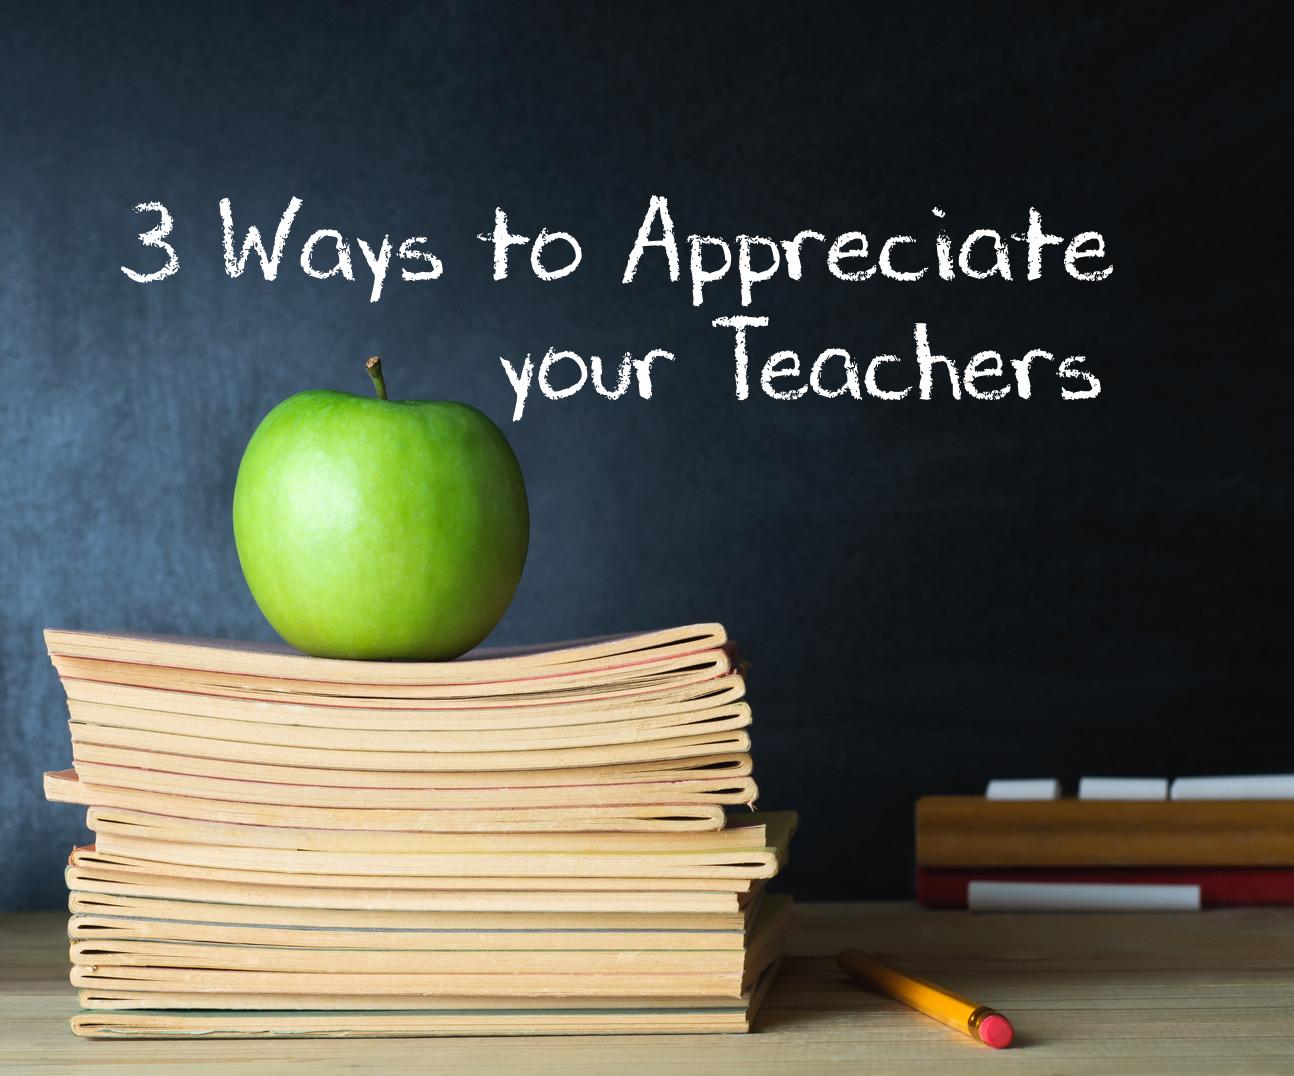 3 Ways to Appreciate your Teachers